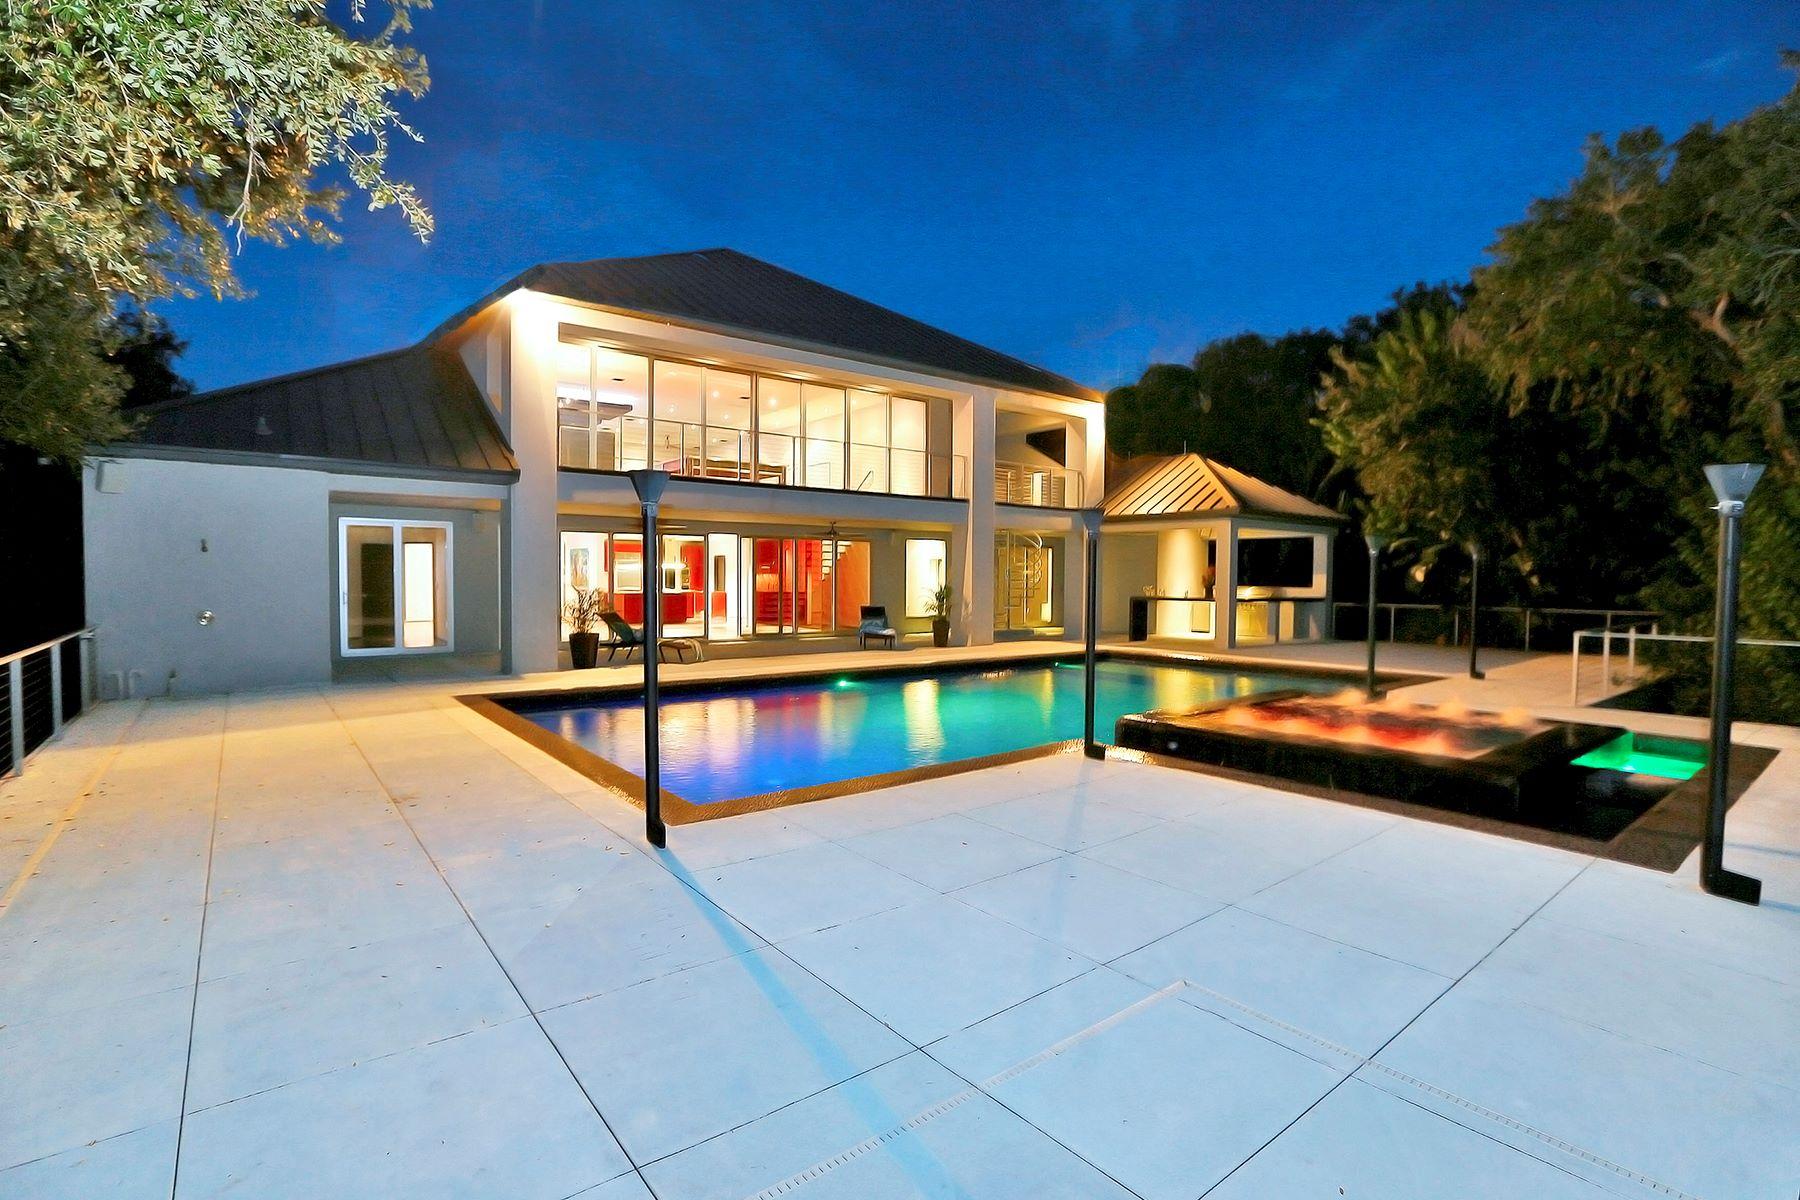 獨棟家庭住宅 為 出售 在 DAYTONA BEACH - PONCE INLET 4542 S Peninsula Dr Ponce Inlet, 佛羅里達州, 32127 美國